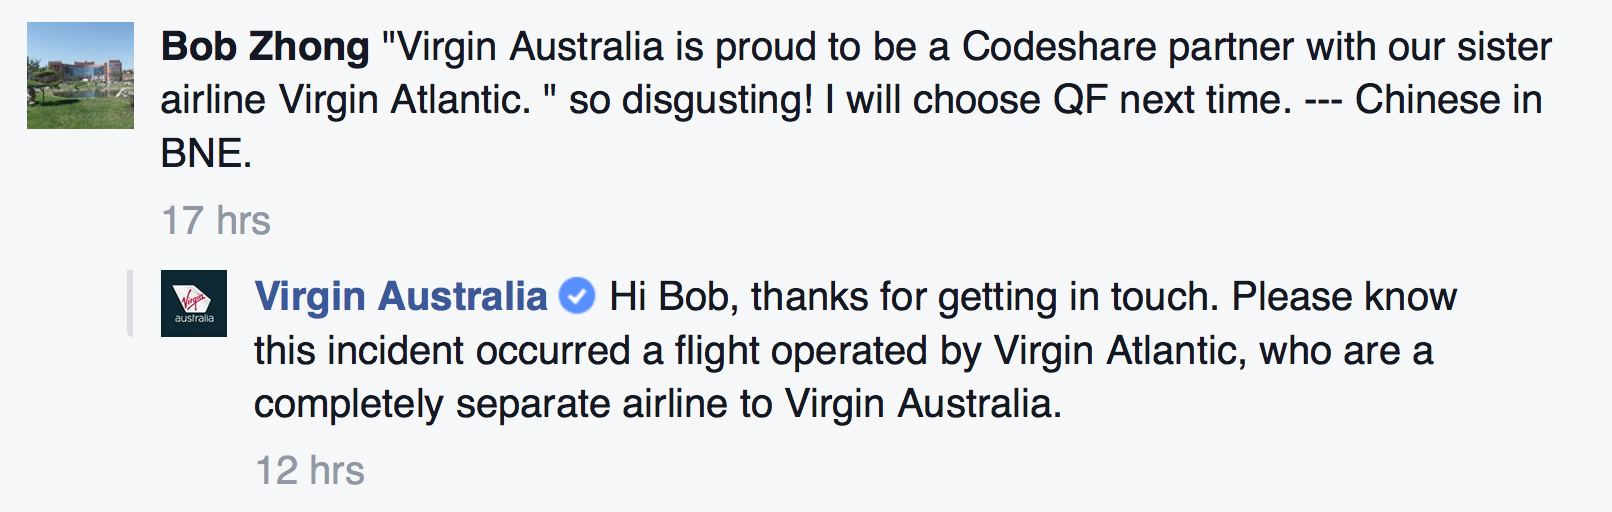 virgin australia 2